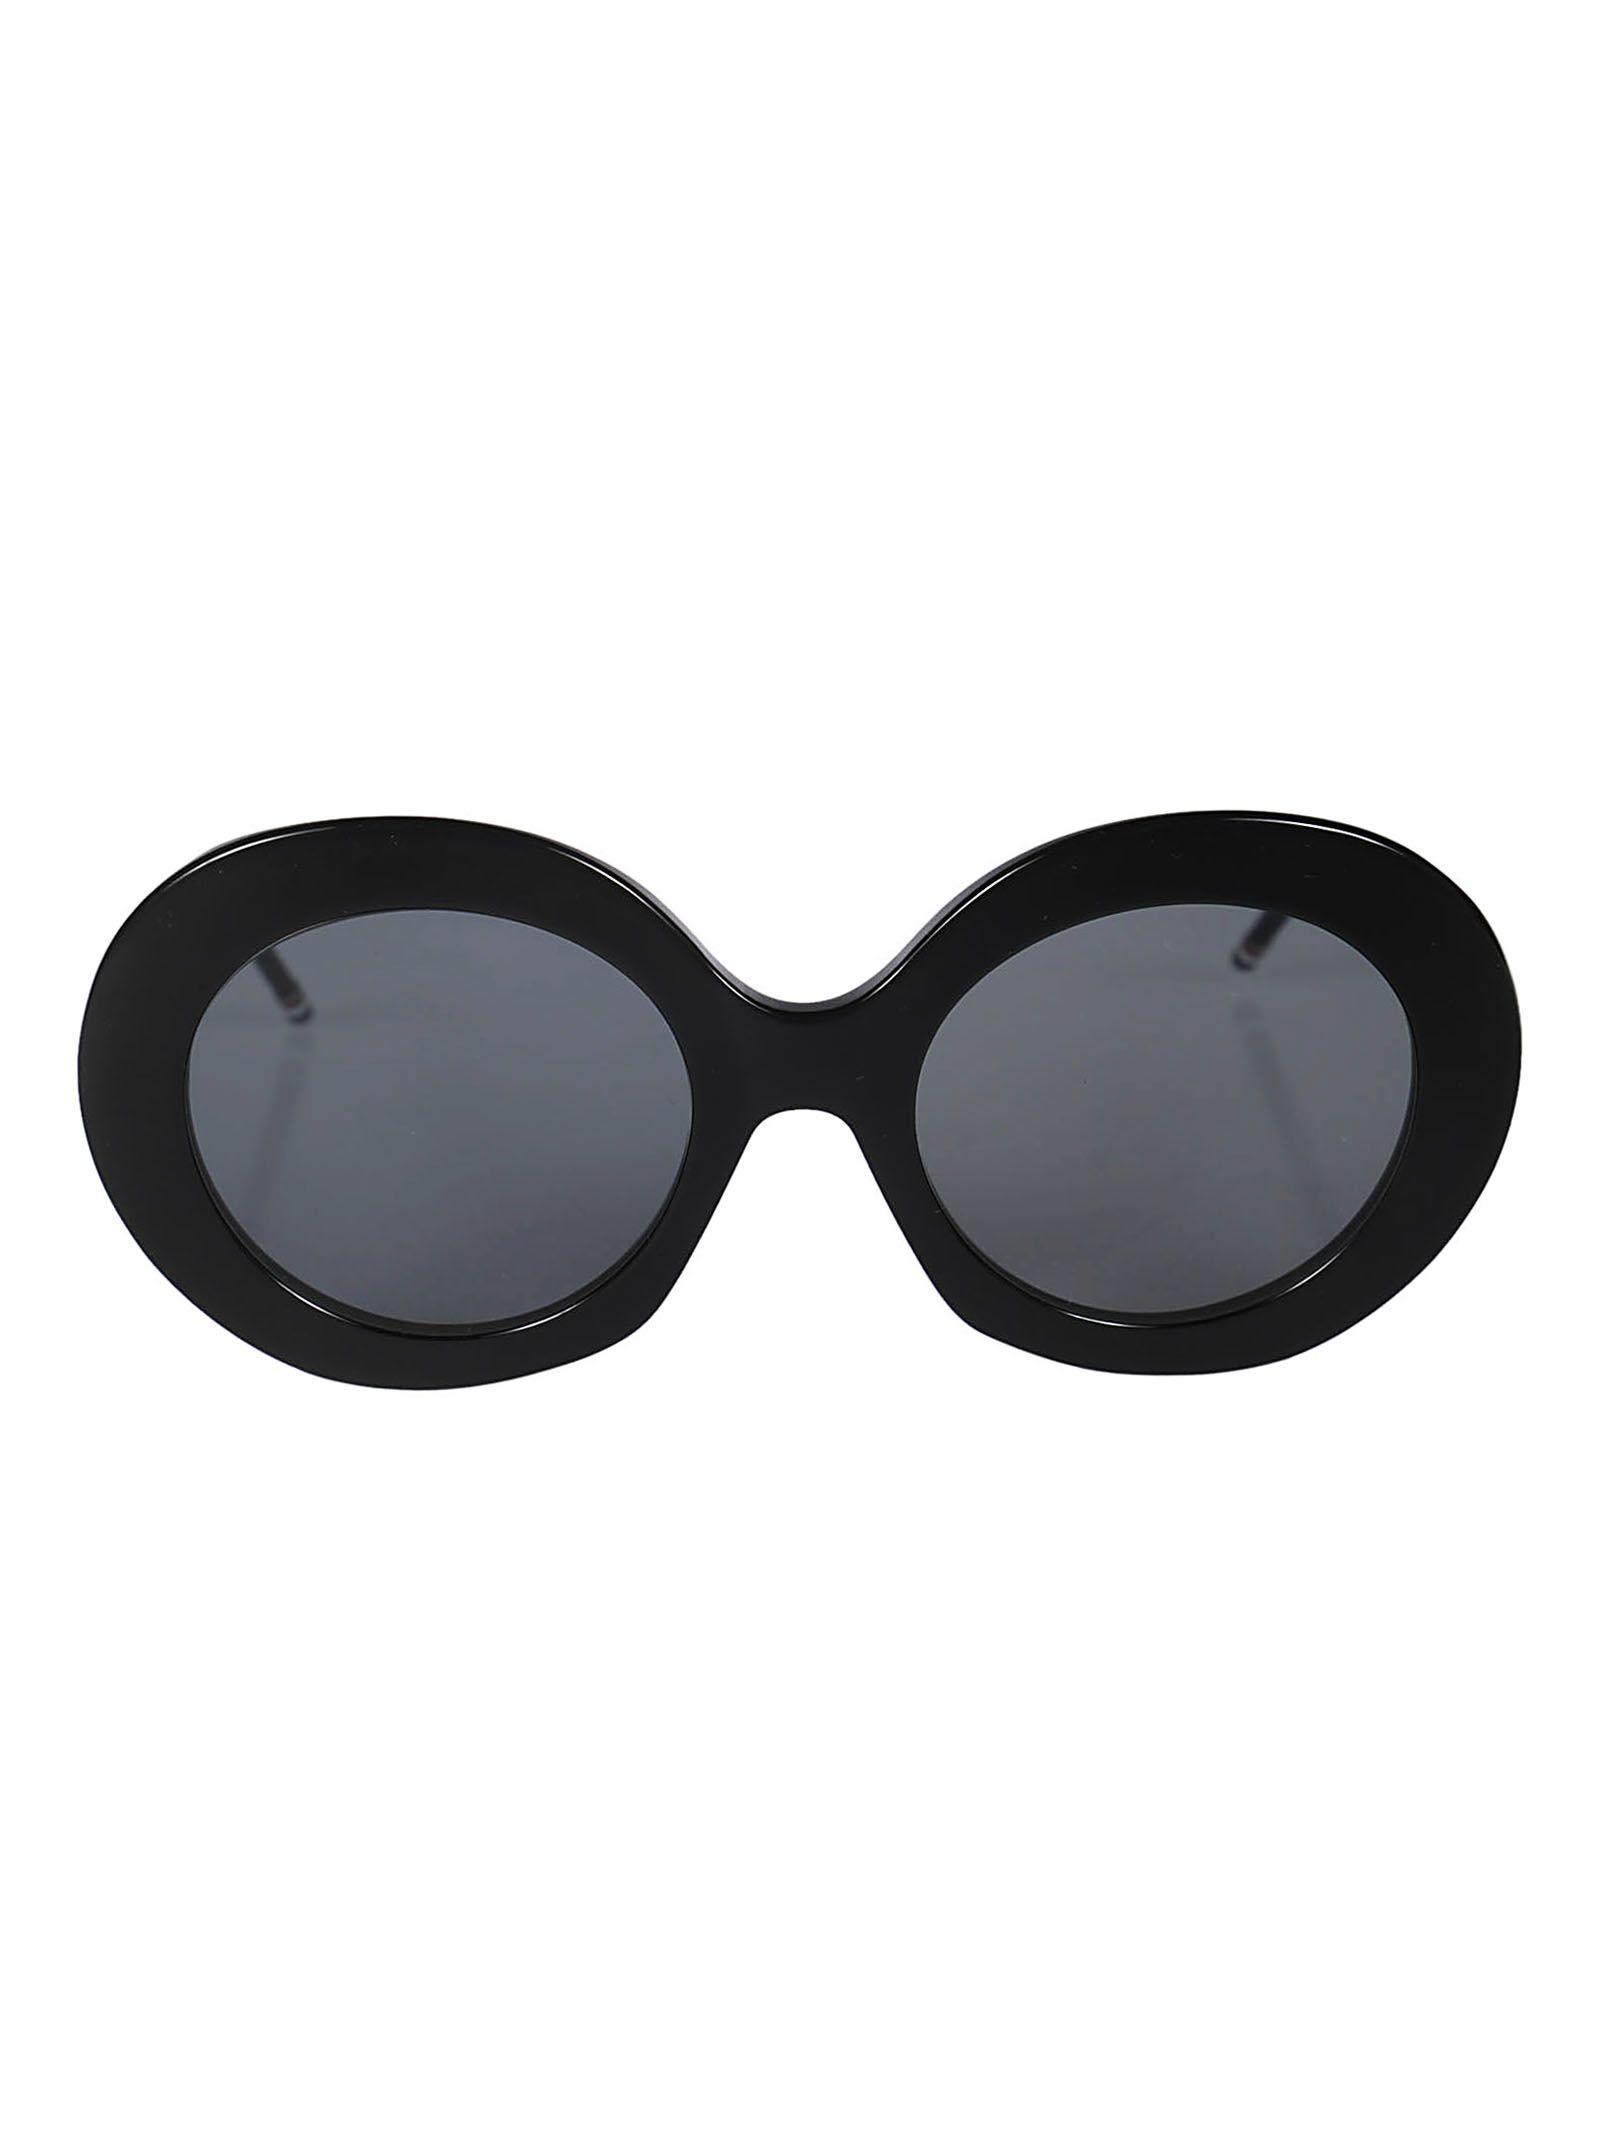 Thom Browne Big Round Sunglasses